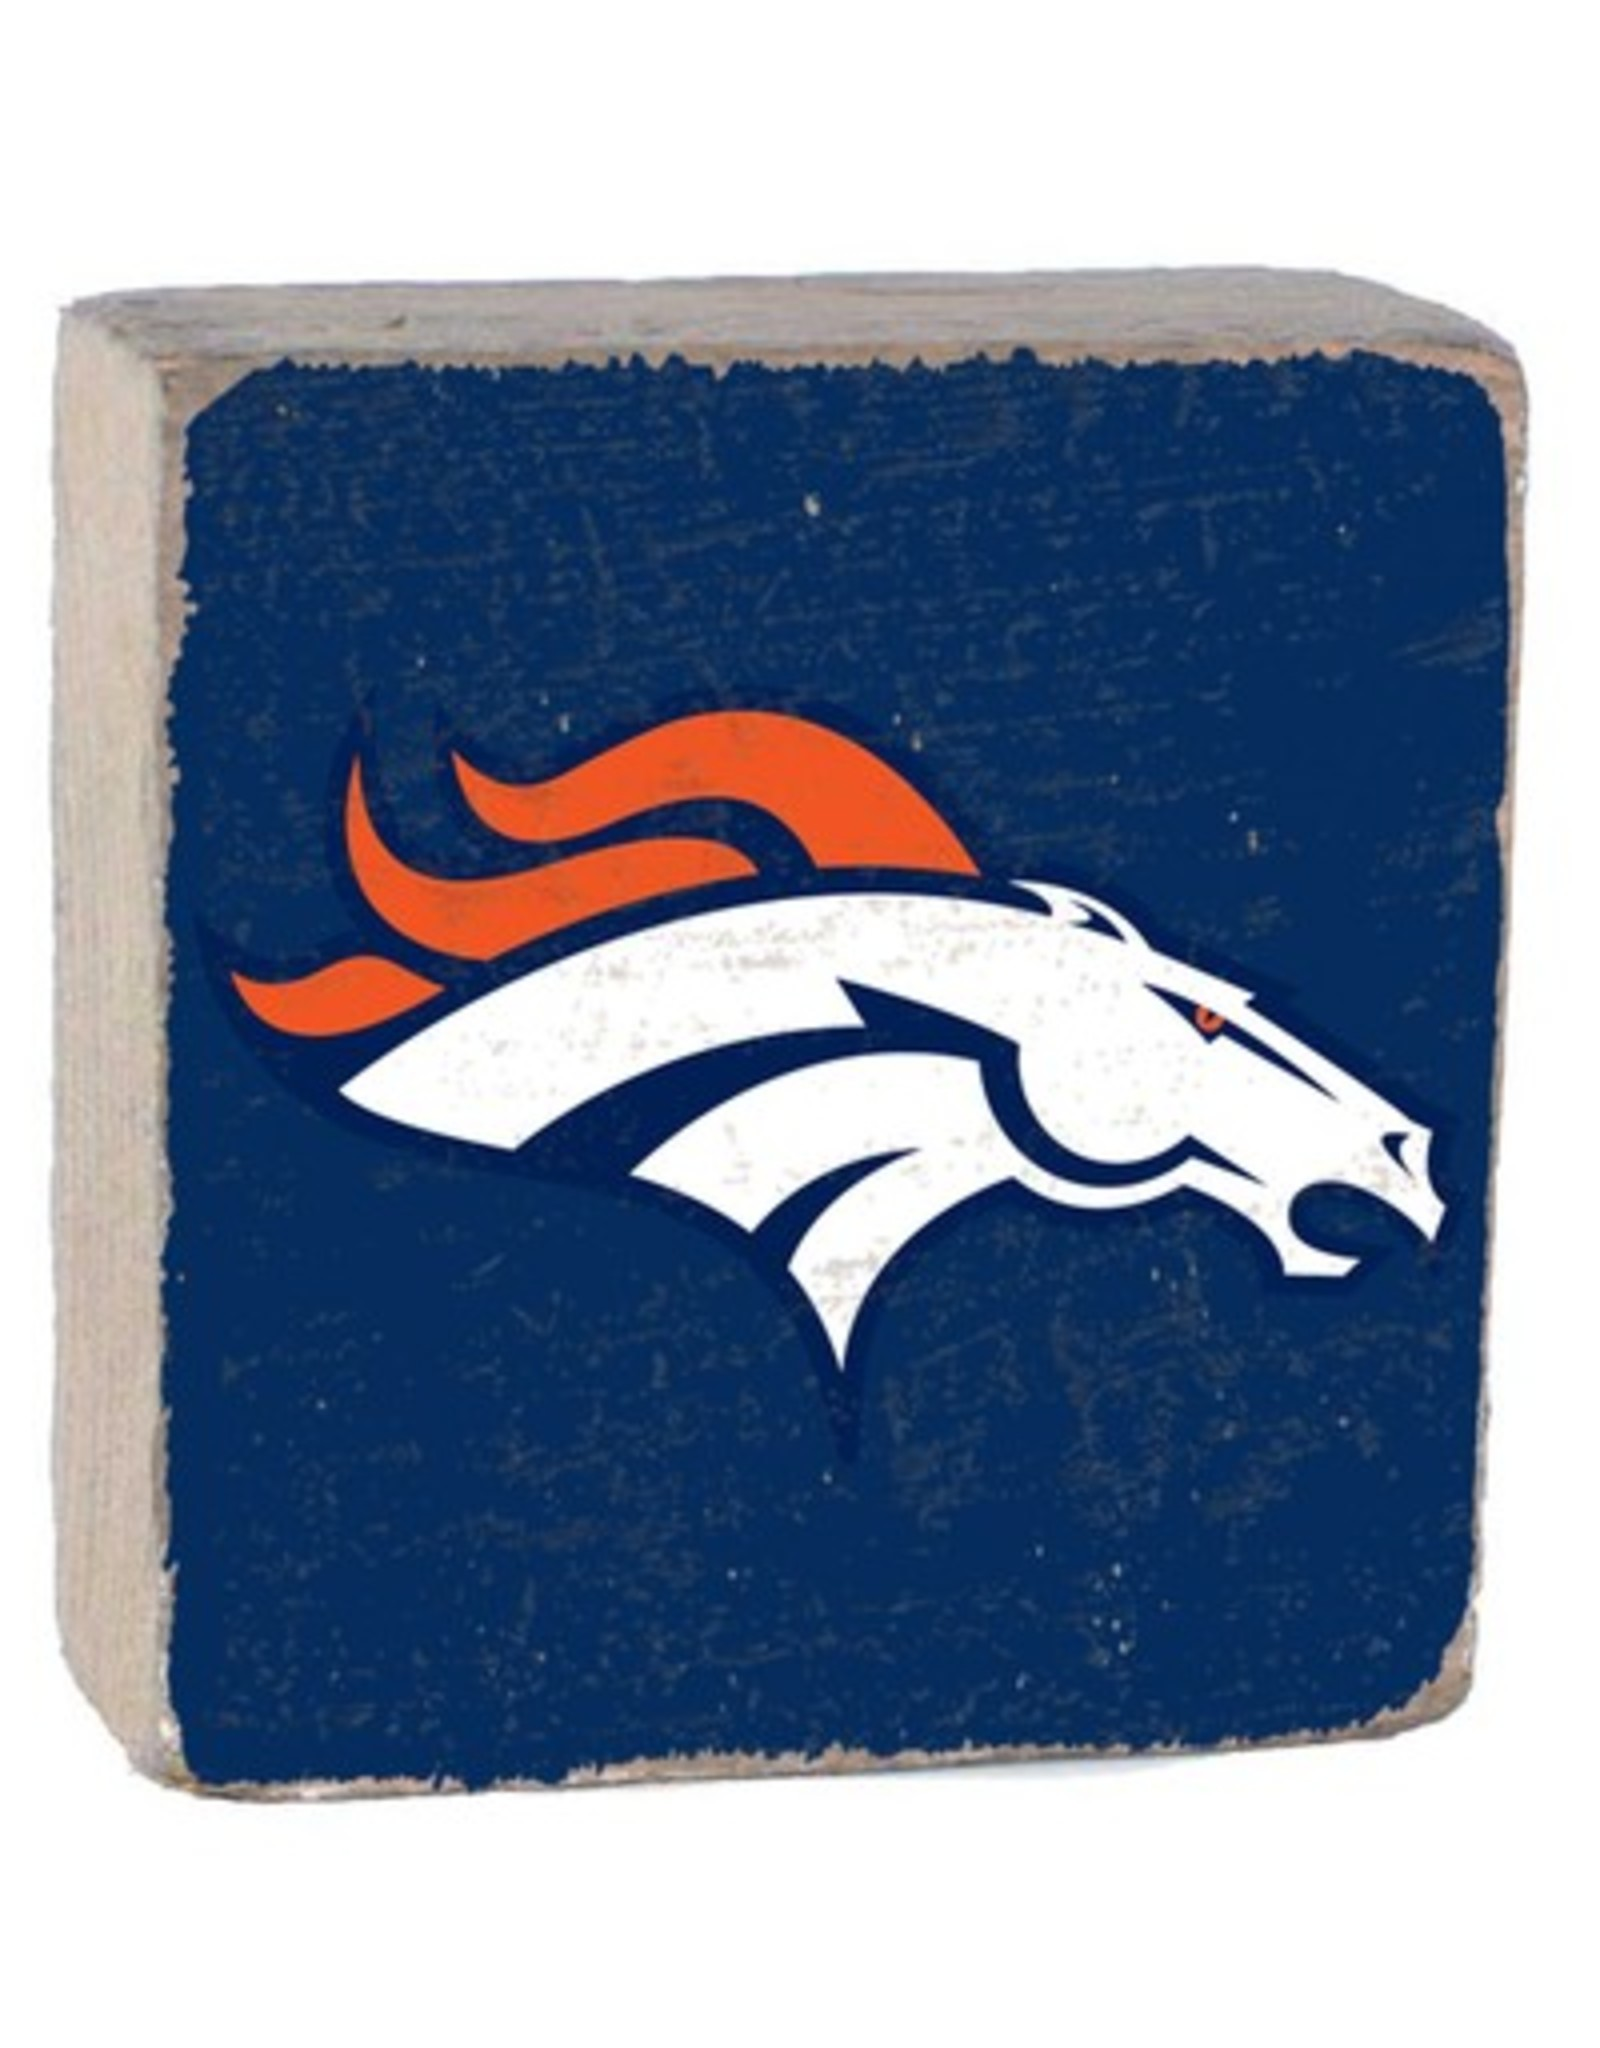 RUSTIC MARLIN Denver Broncos Rustic Wood Team Block